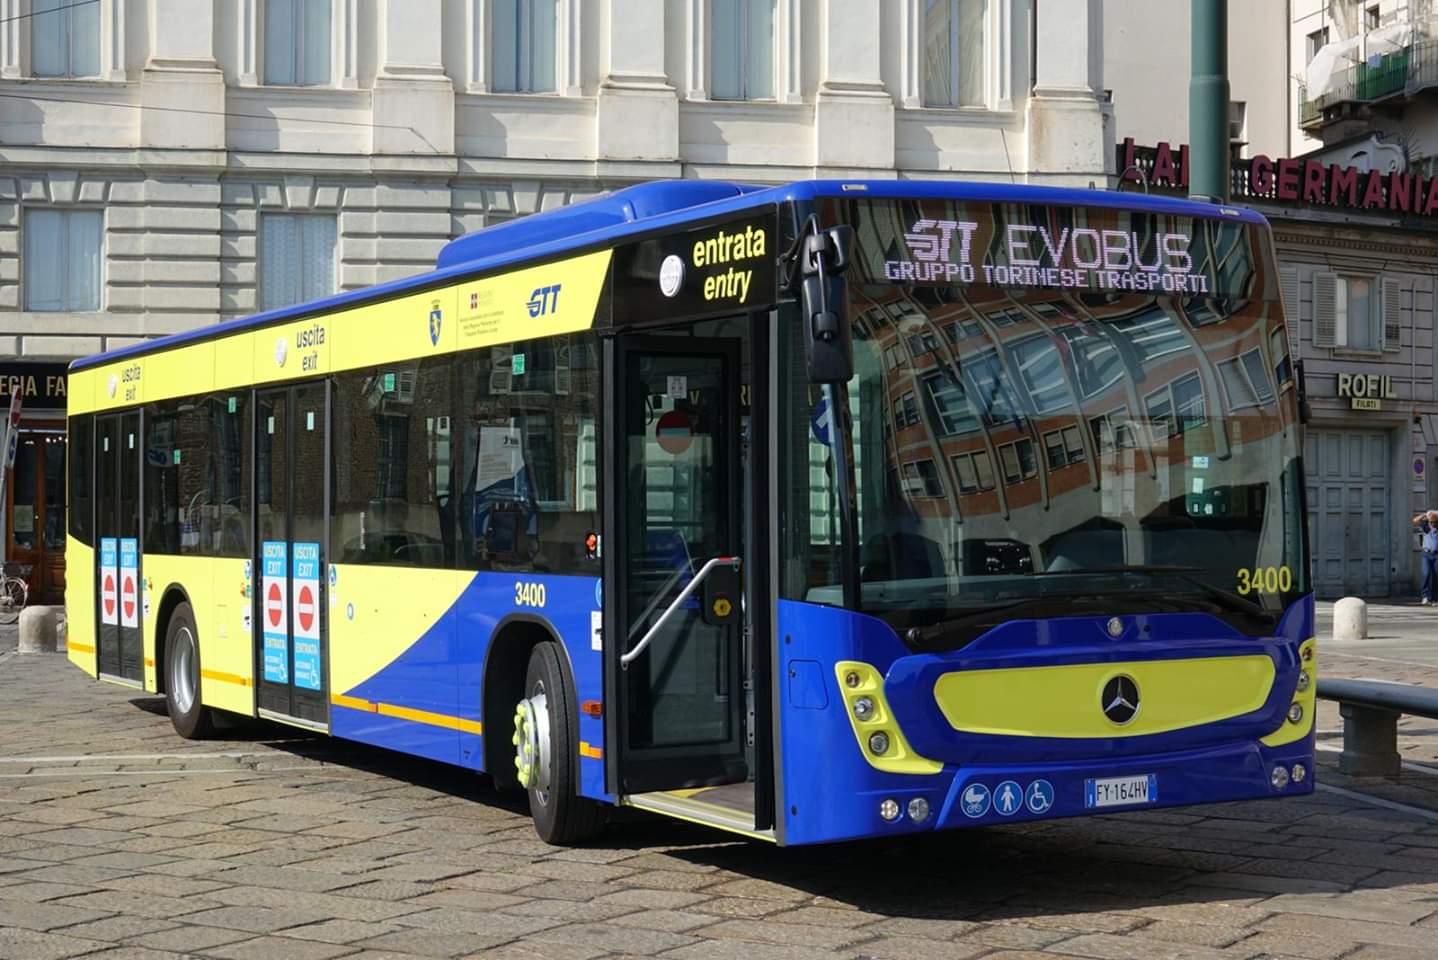 Photo of Gtt, a Torino arrivano i nuovi mezzi: i veicoli gialli e blu circoleranno da questo mese